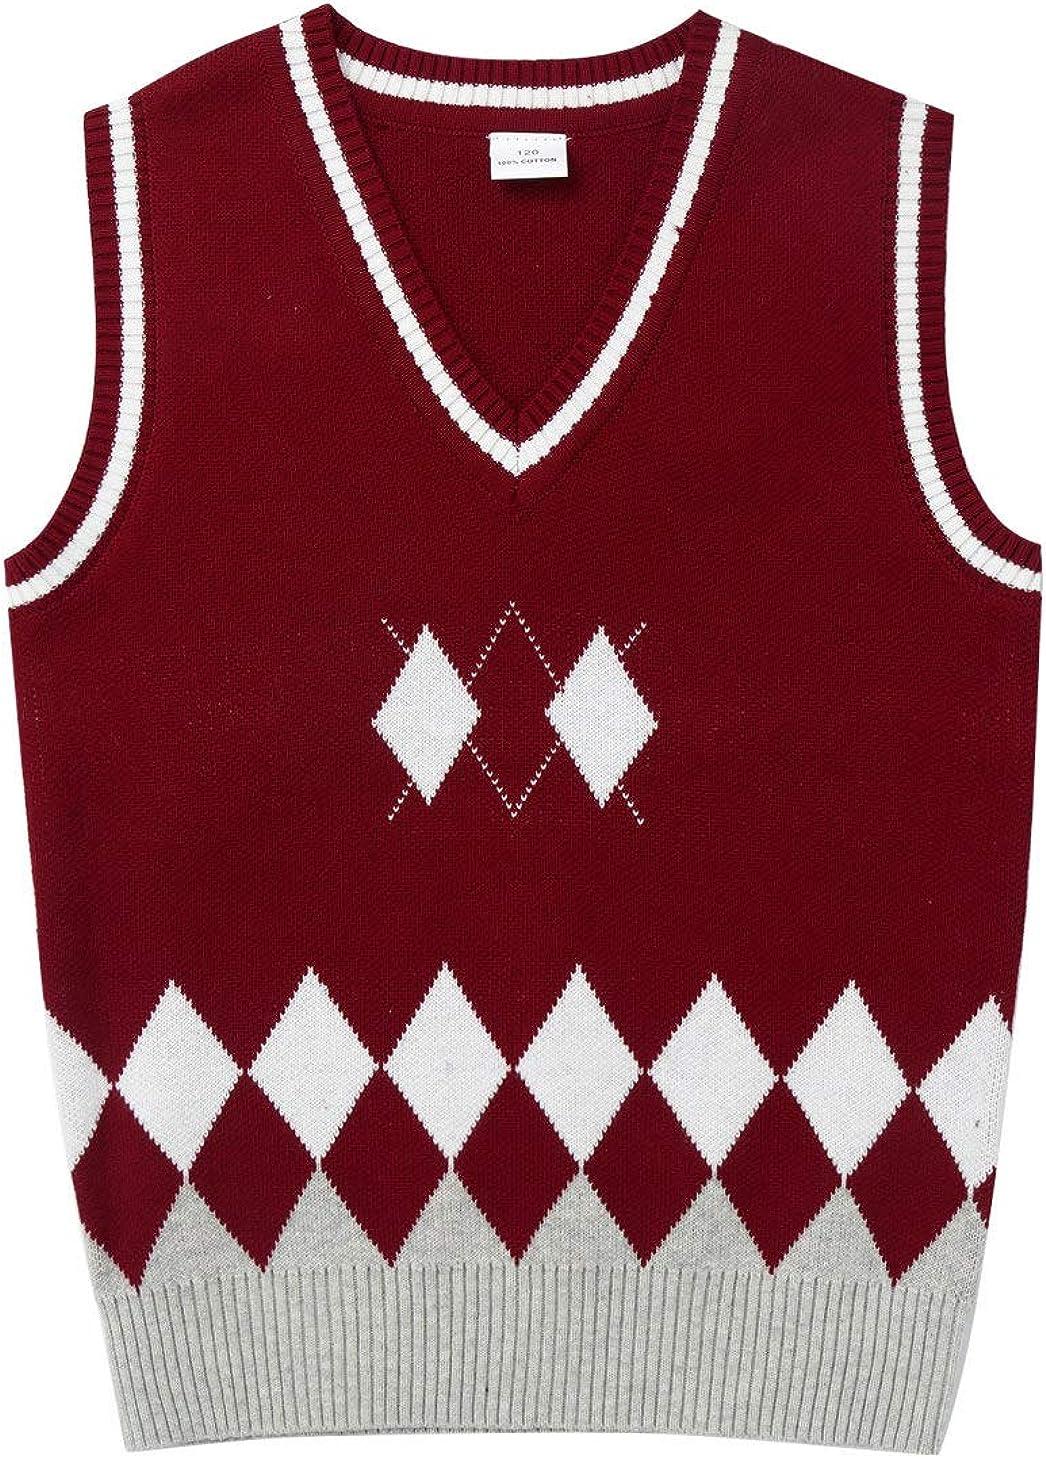 winying Kids Boys Girls Uniform Knitted Vest Cotton V-Neck Crochet Knitwear Sweater Winter Waistcoat